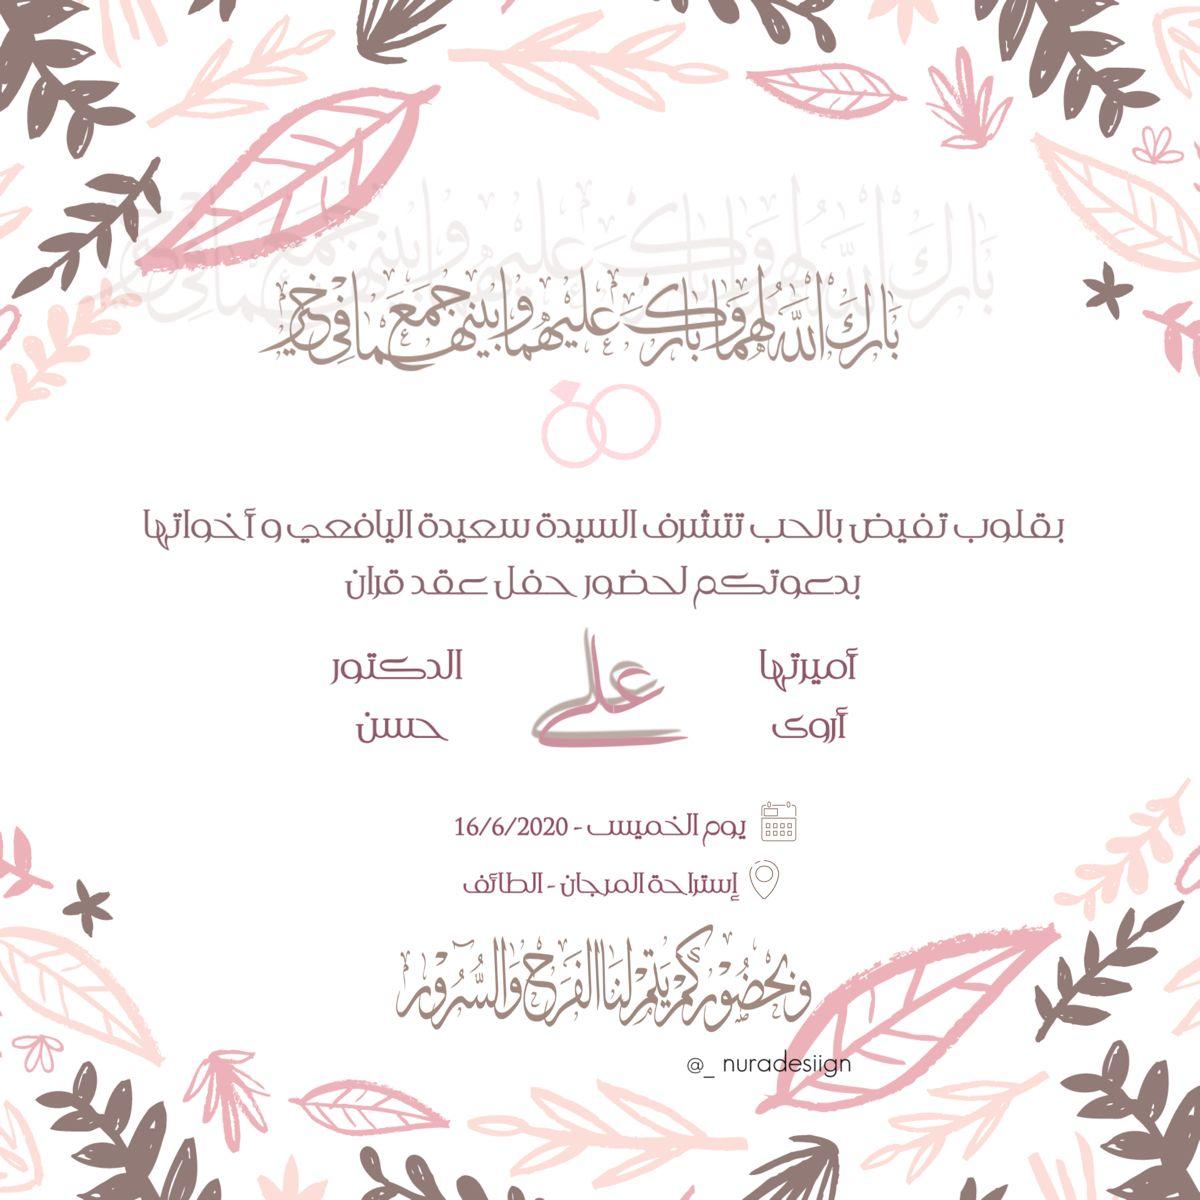 Na Nuradesiign Instagram Photos And Videos Wedding Background Wallpaper Flower Frame Wedding Cards